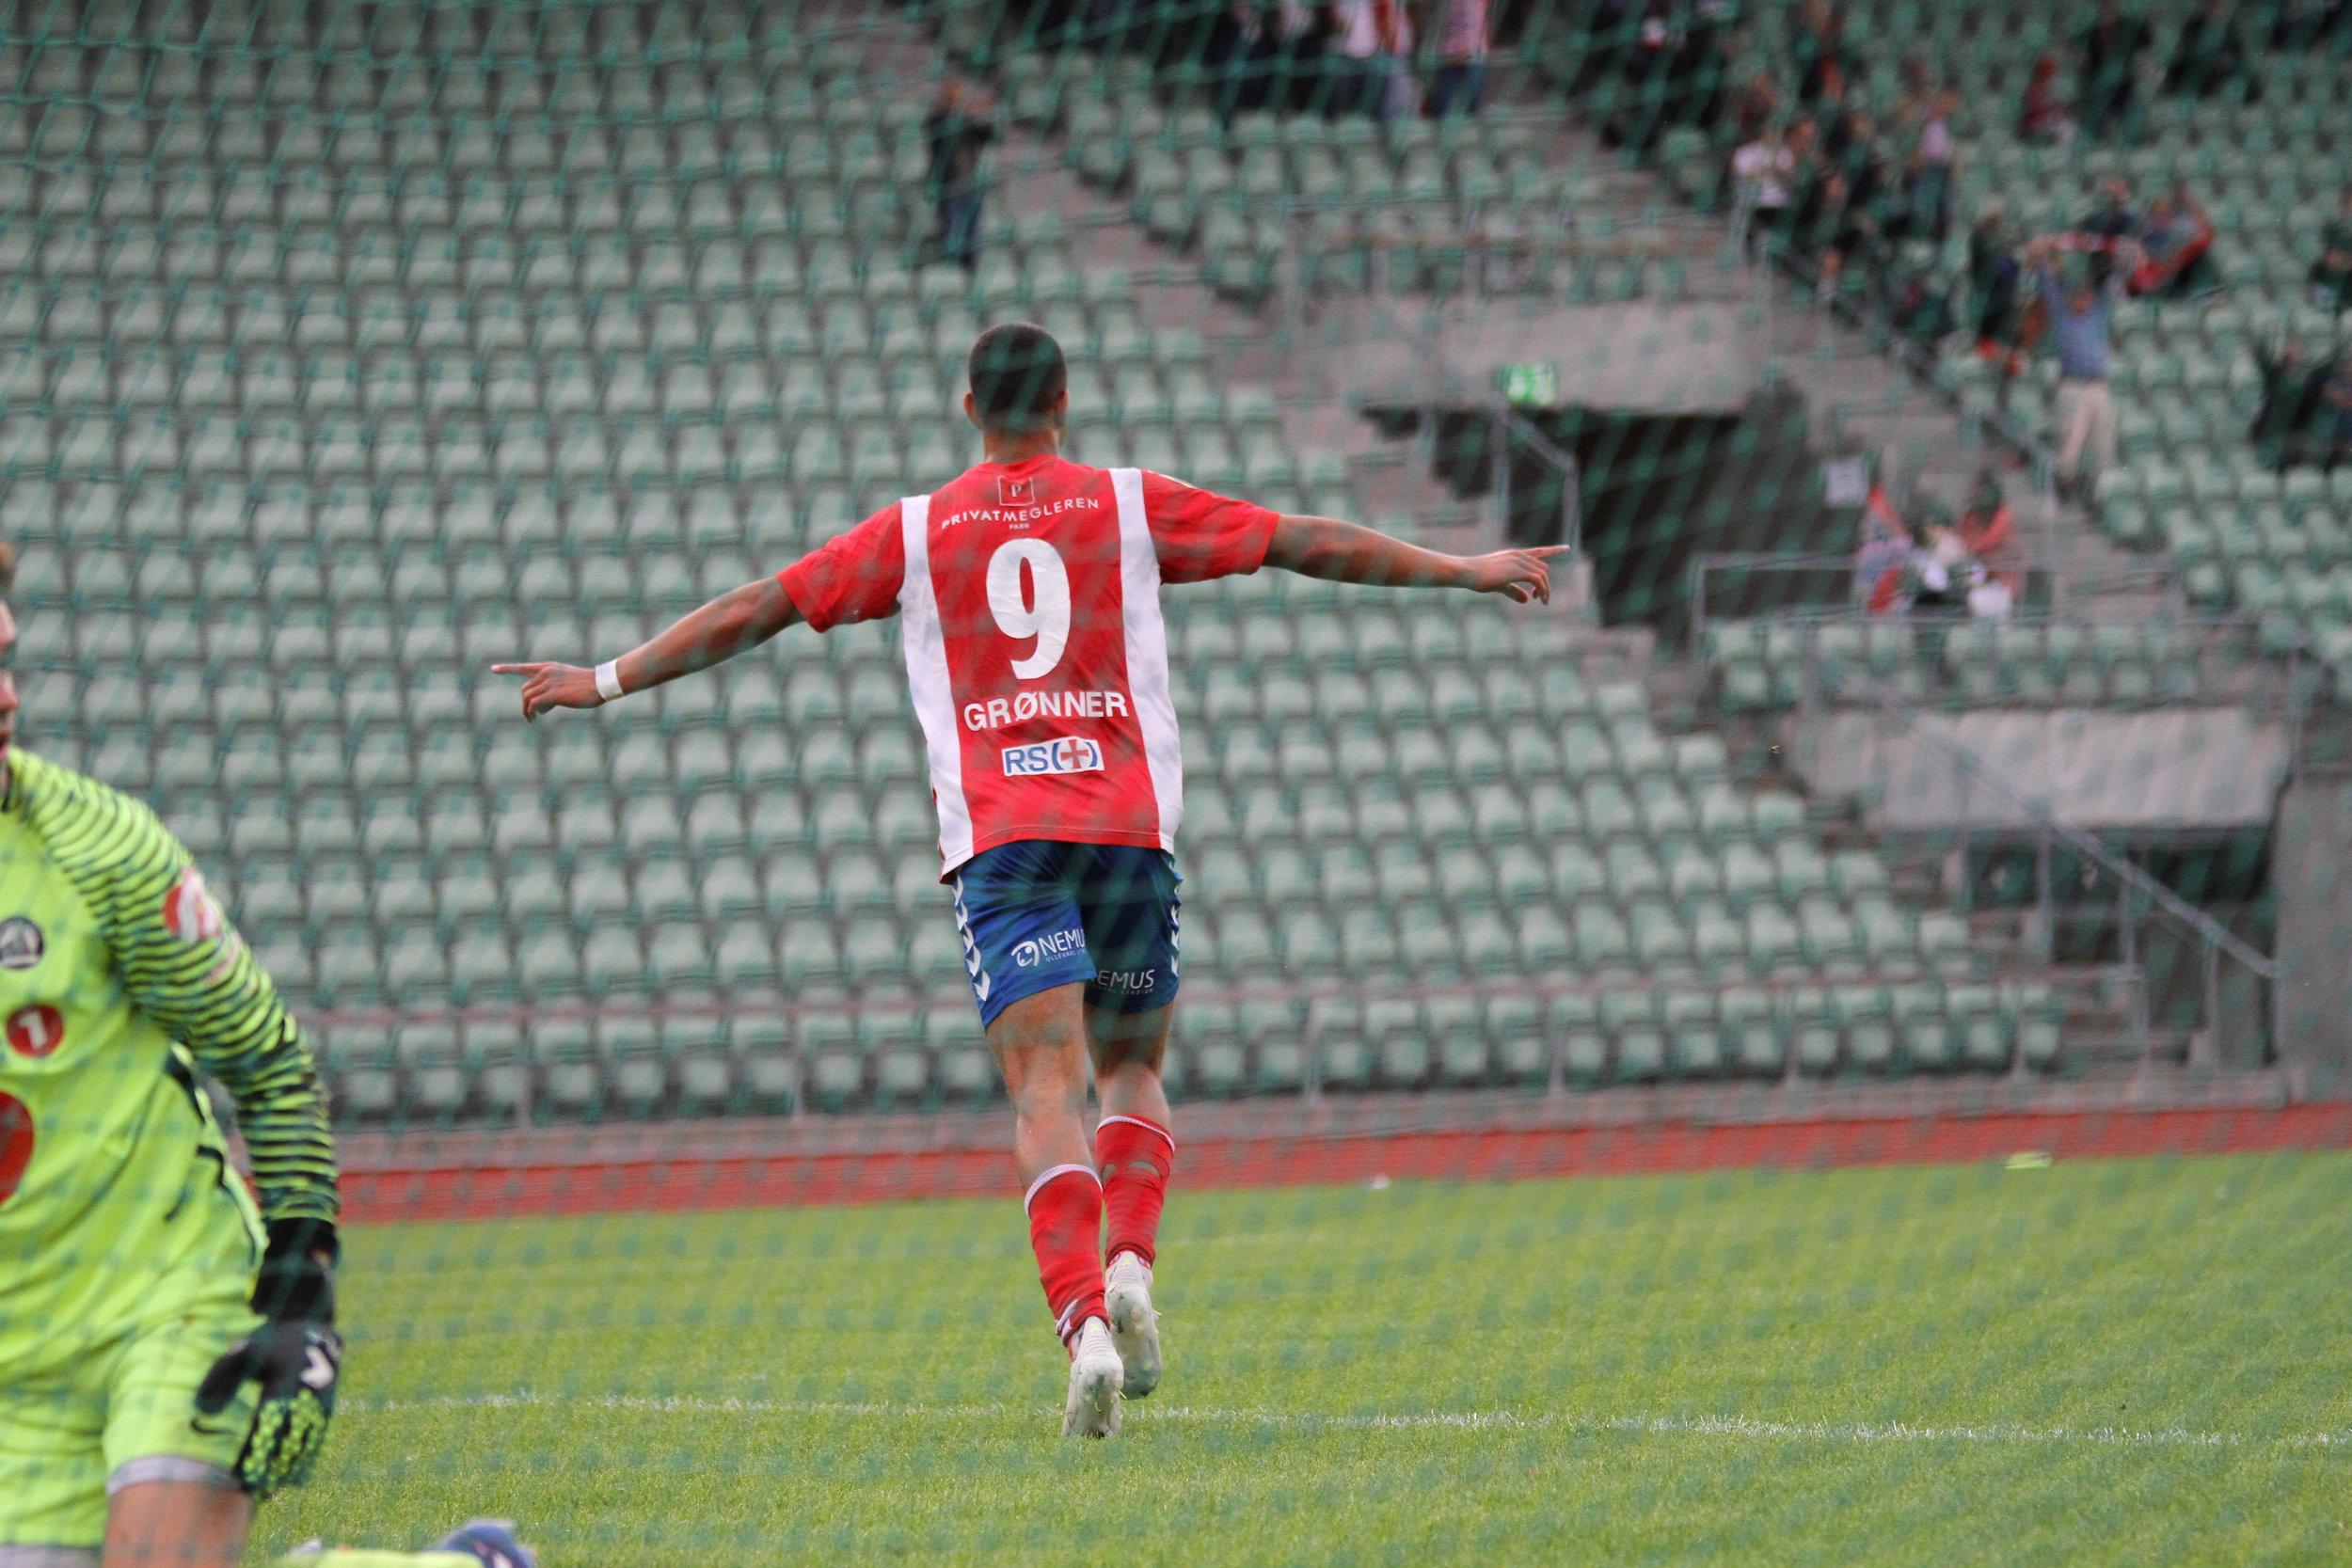 Emanuel Longe Grønner scoret to og hadde en assist sist. Kan han fortsette? Foto: Frank Halse